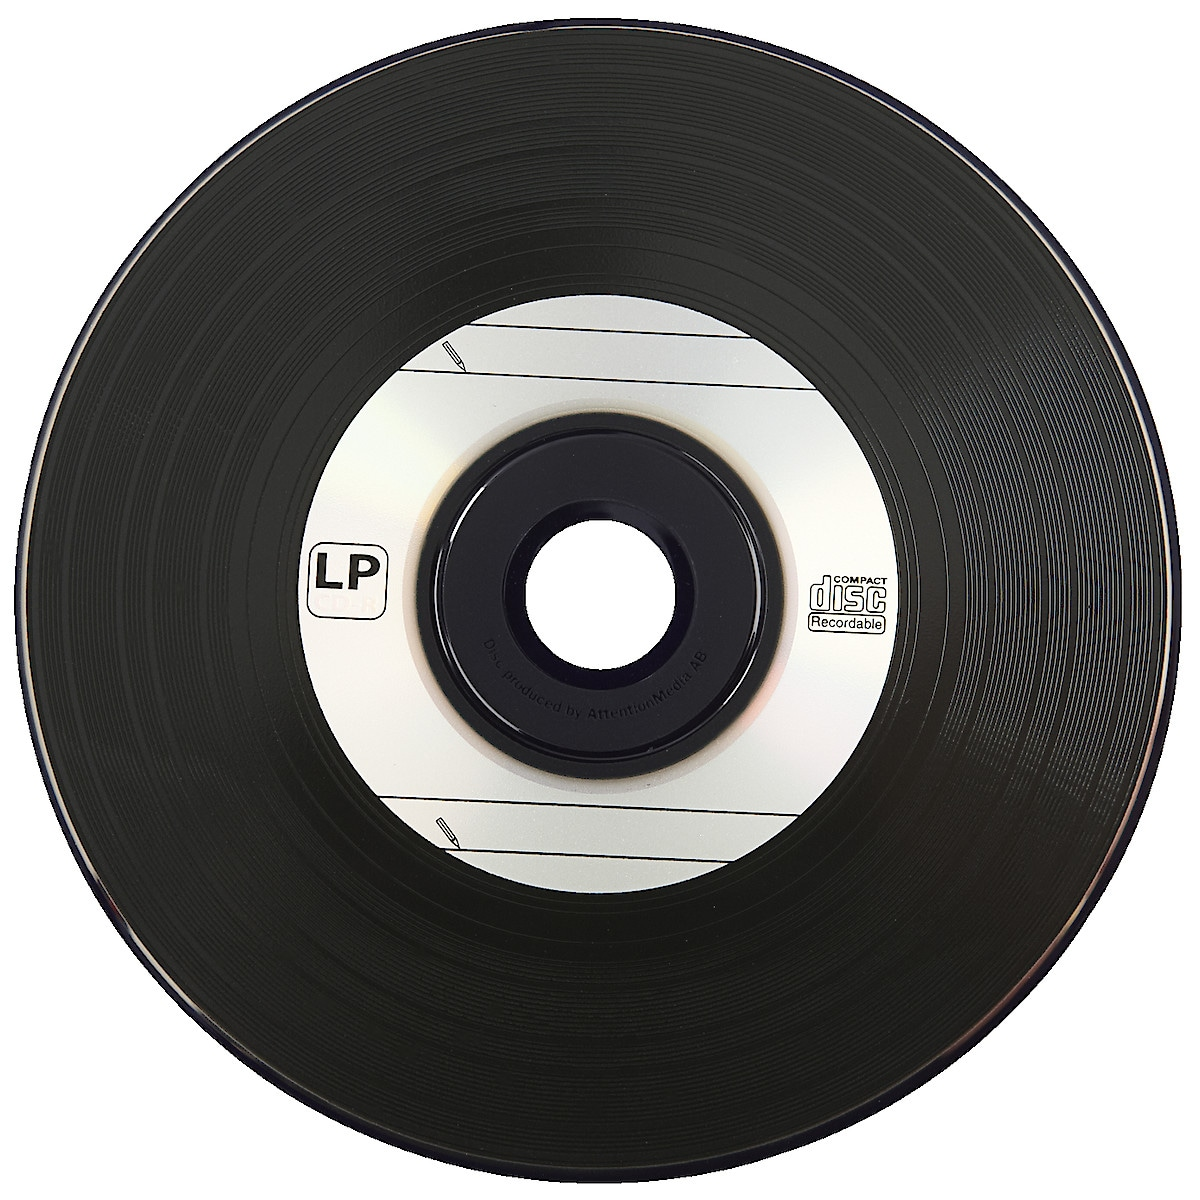 LP-/CD-R-levy